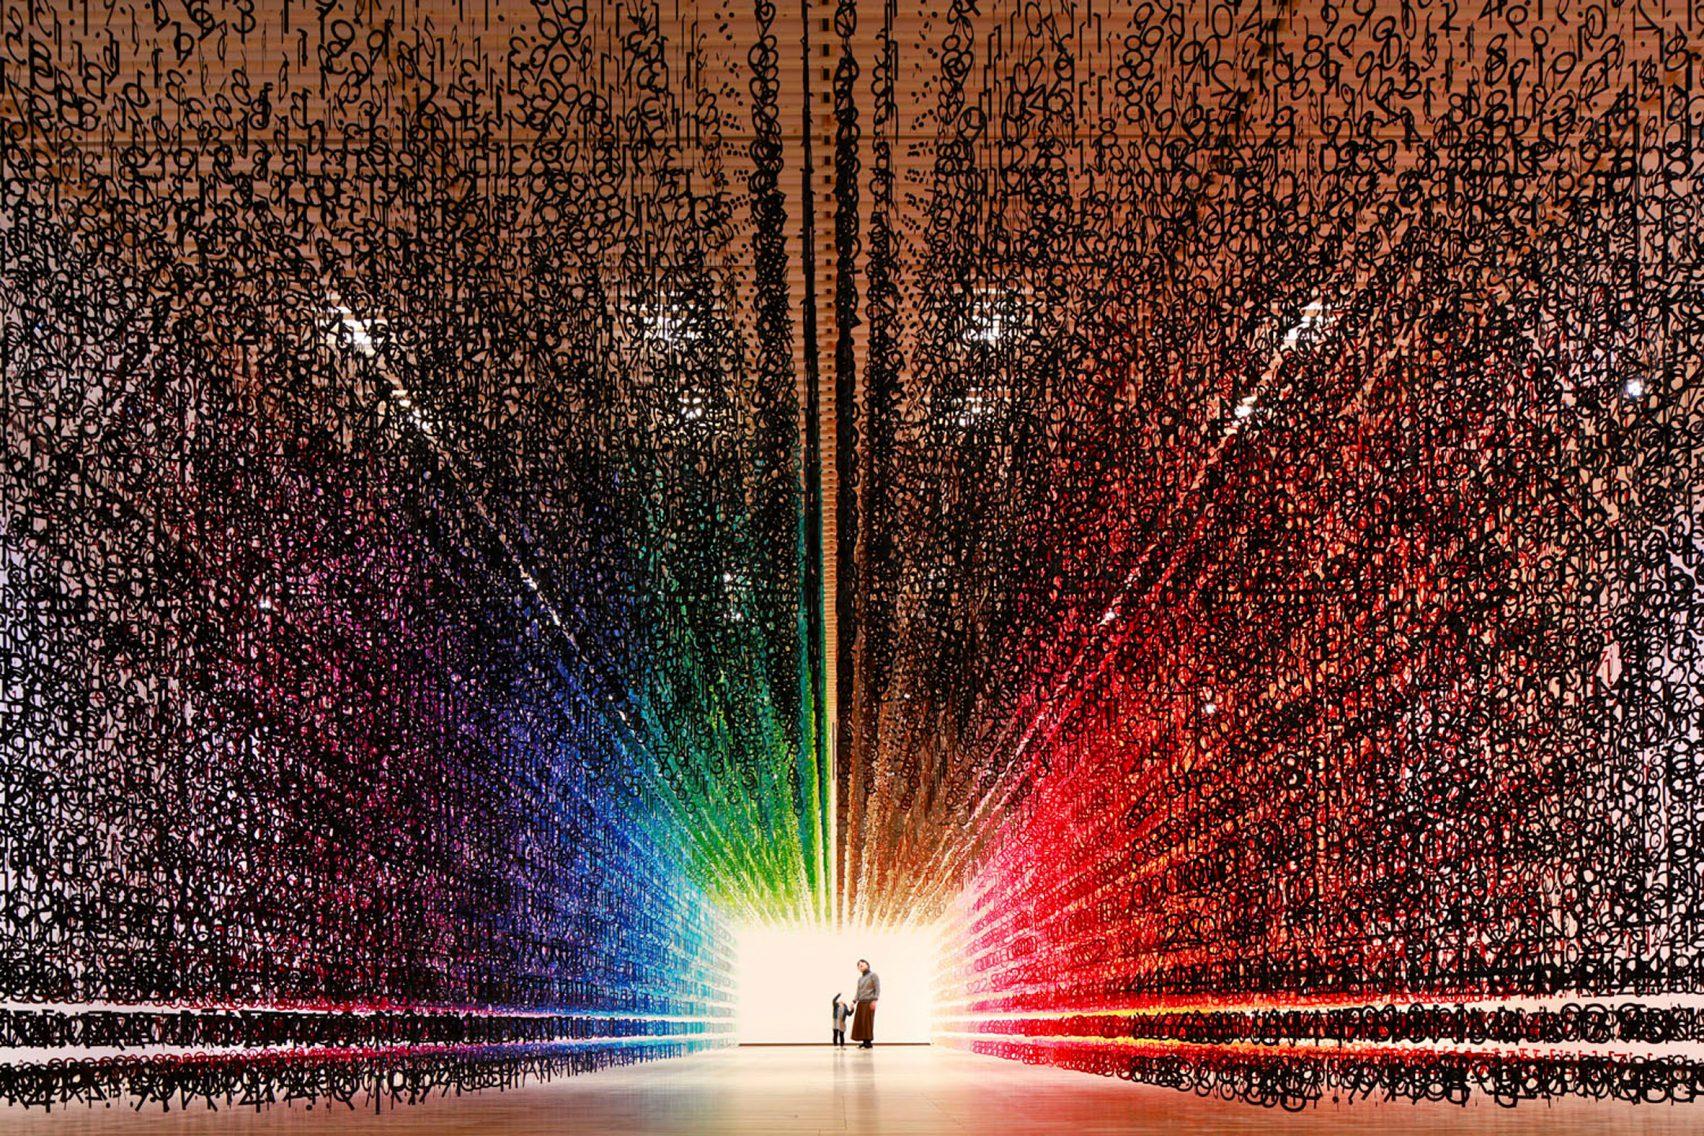 colour-of-time-emmanuelle-moureaux-installation-rainbow-toyama-museum-art-design-japan_dezeen_2364_col_0-1704x1136.jpg